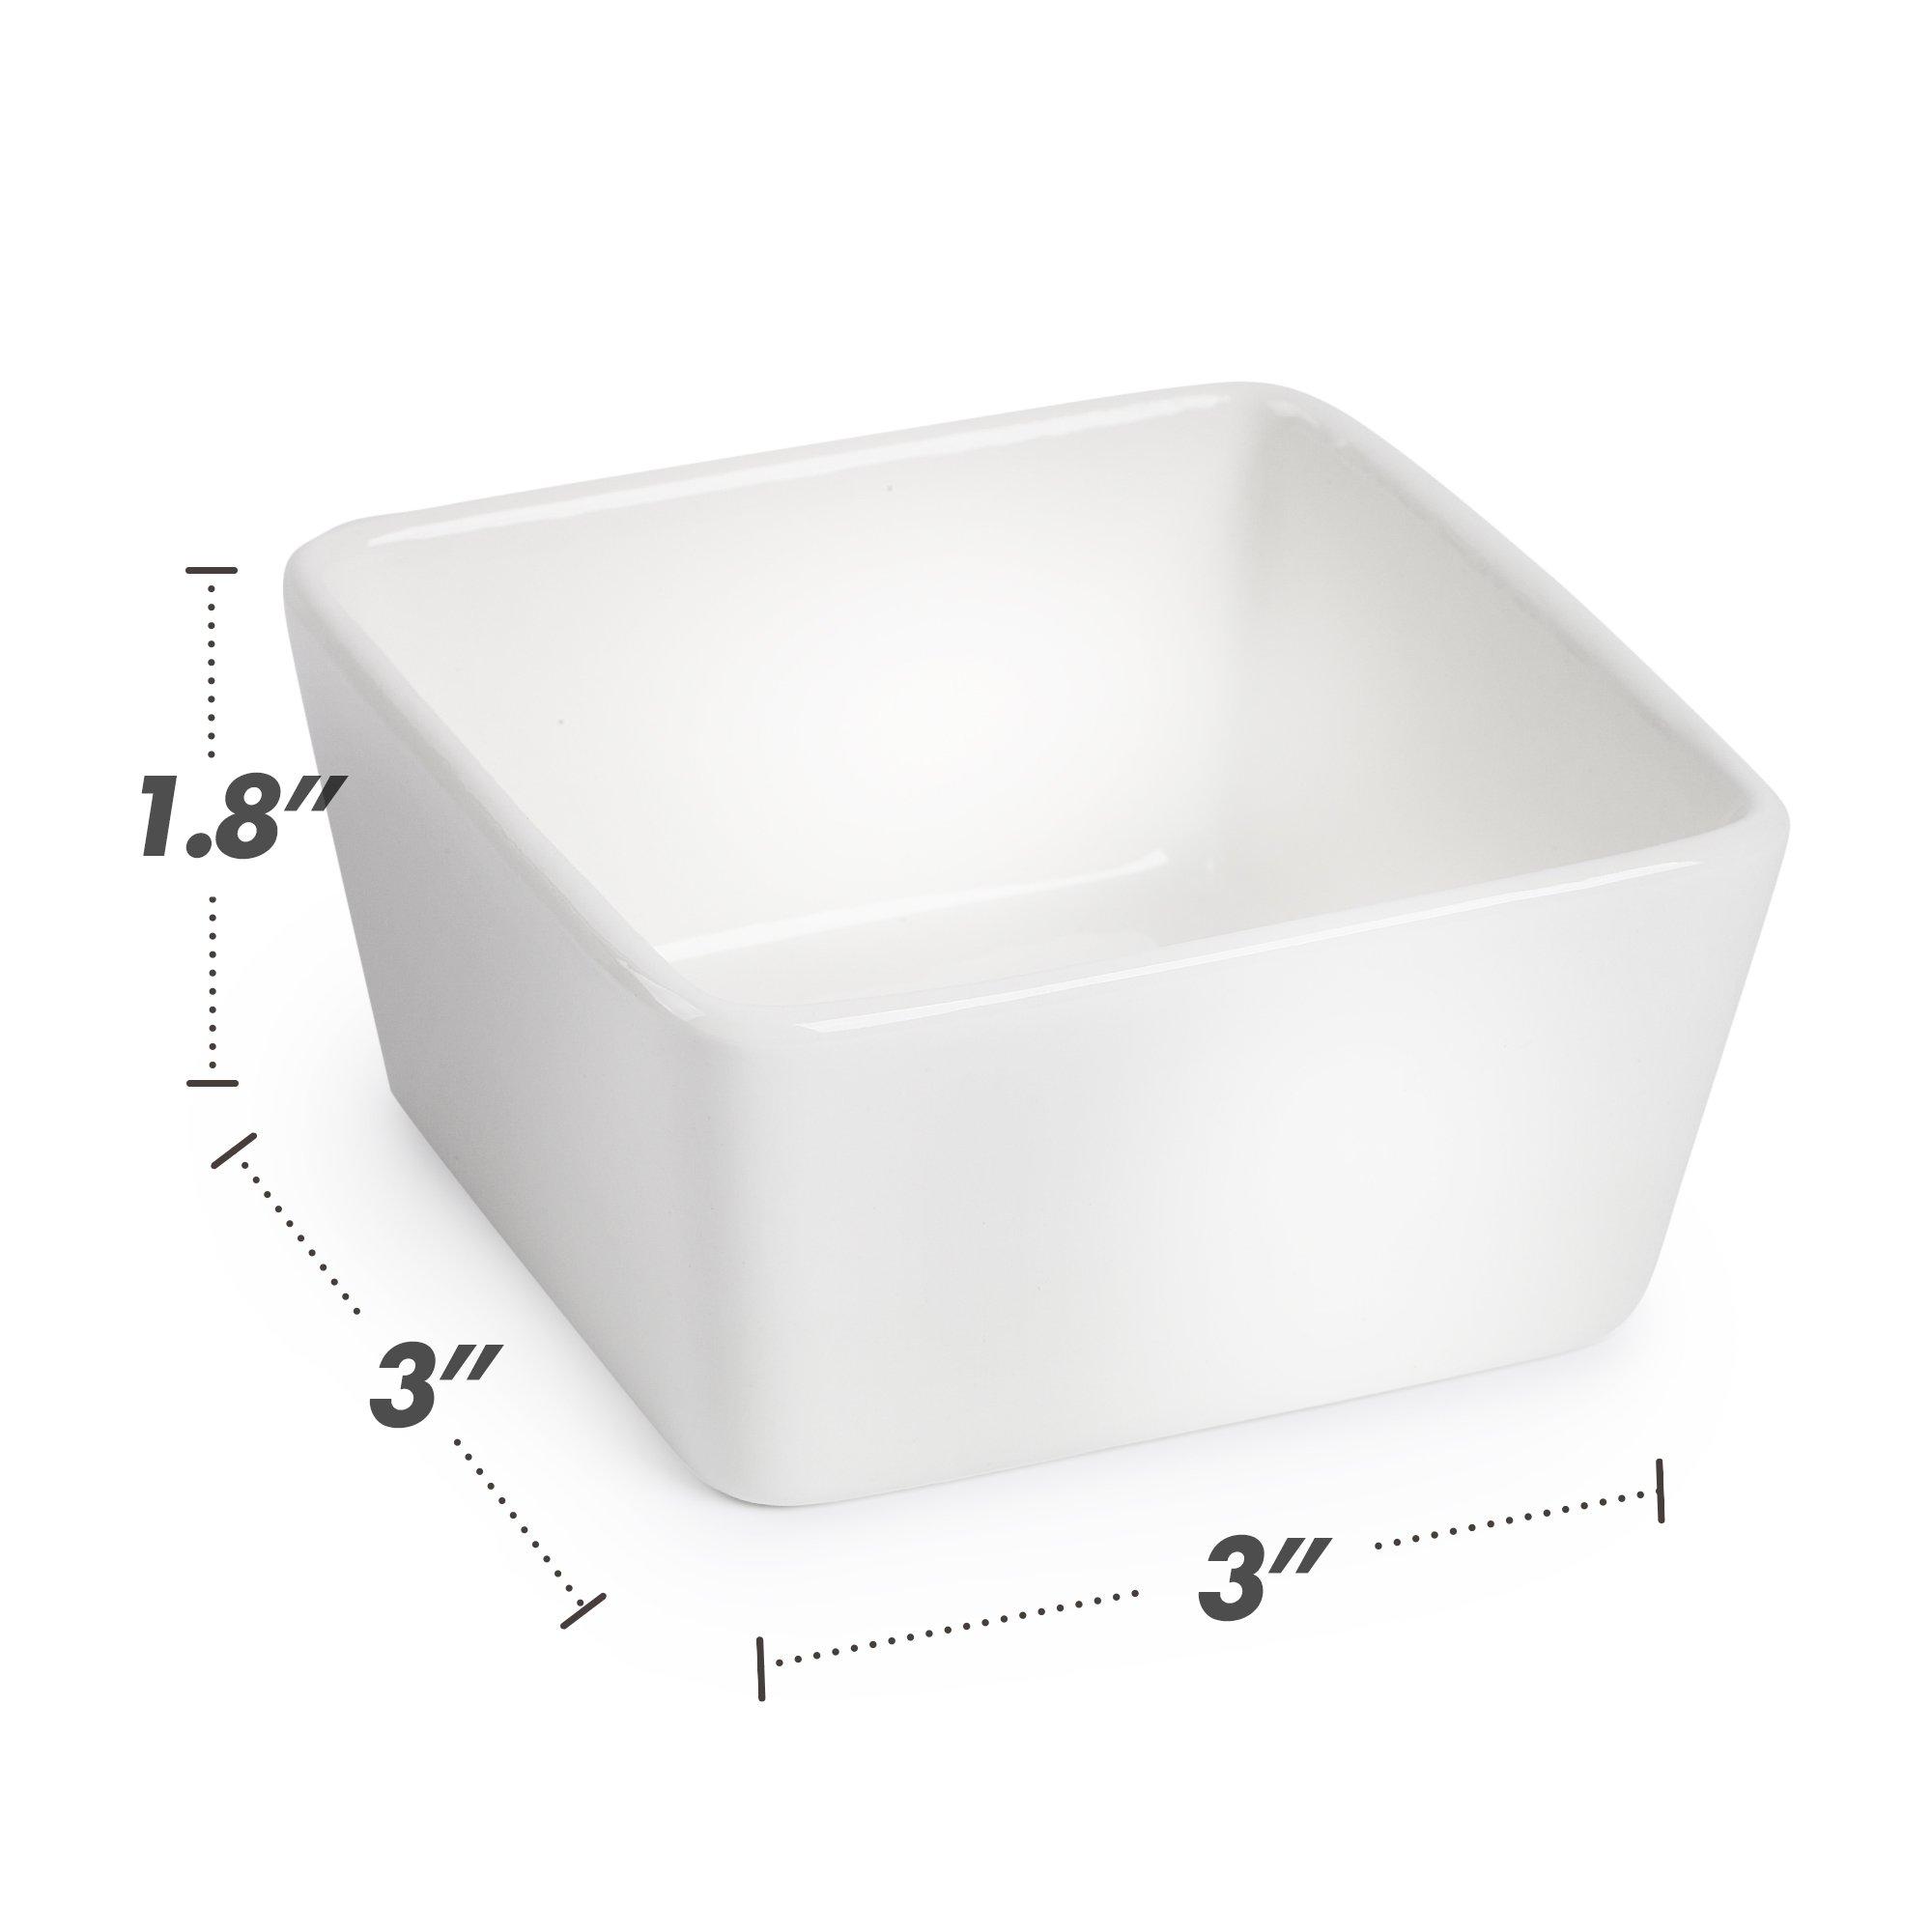 BTäT - Ramekins 8 oz - Set of 8 Square, Porcelain Ramekins, Ramekins for Baking, Creme Brulee Dish, Souffle Cups, Appetizer Cups, Custard Dish, Pudding cups, Ramiken Set, Dipping Bowl. by Brew To A Tea (Image #8)